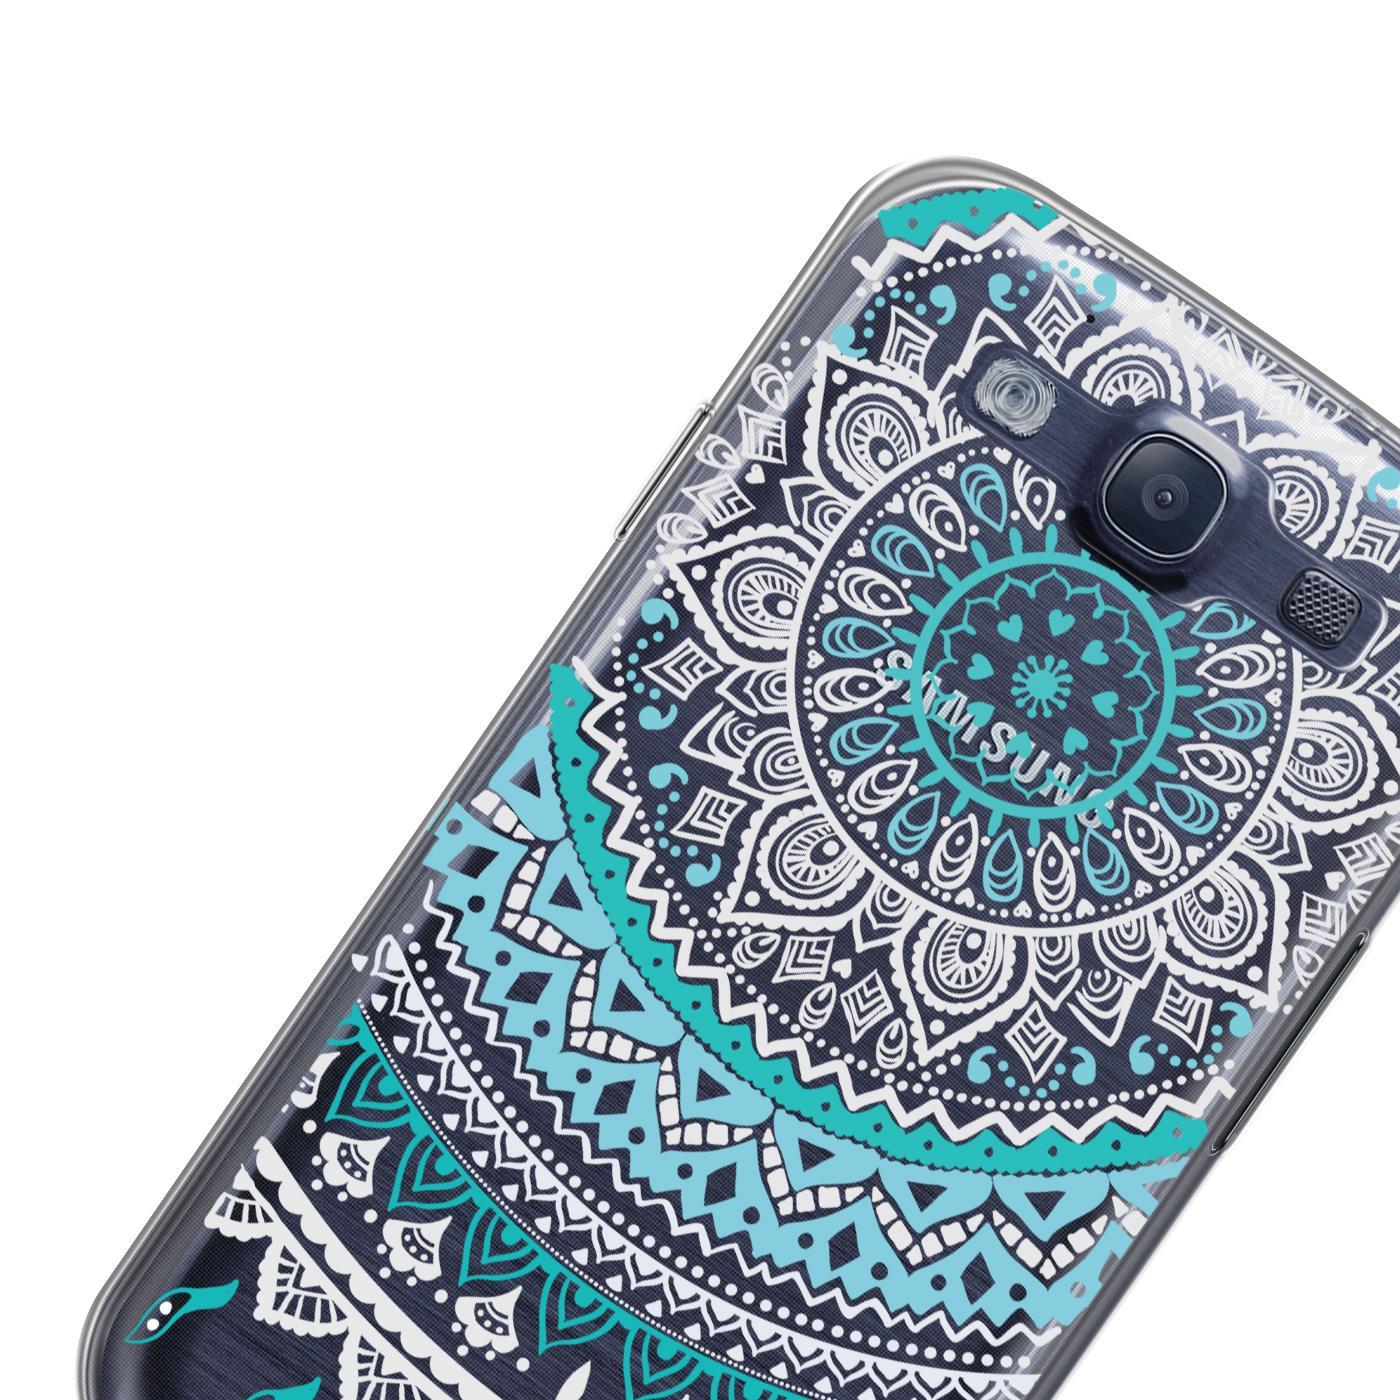 Samsung-Galaxy-S3-Neo-Handy-Schutz-Huelle-Case-TPU-Silikon-Cover-Tasche-Mandala Indexbild 9